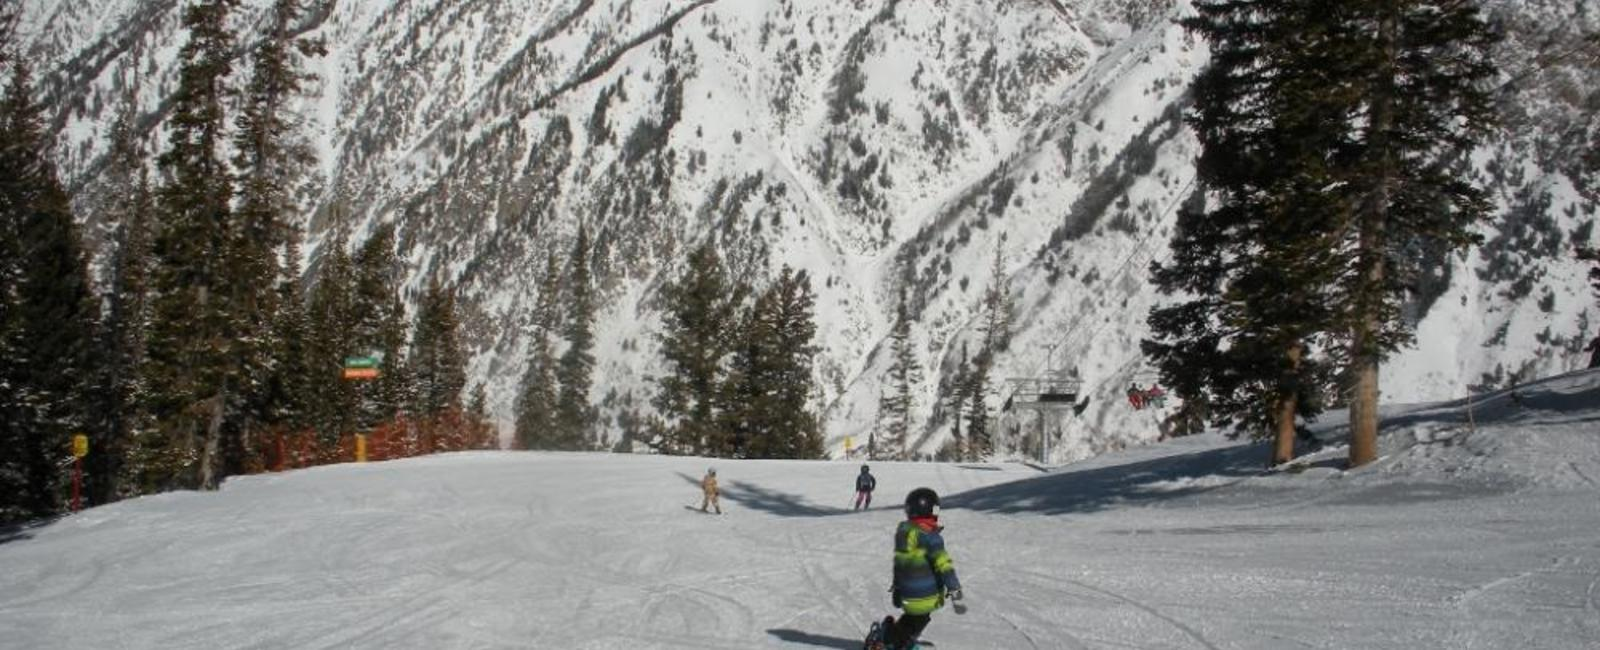 Skiing Snowbird with Kids